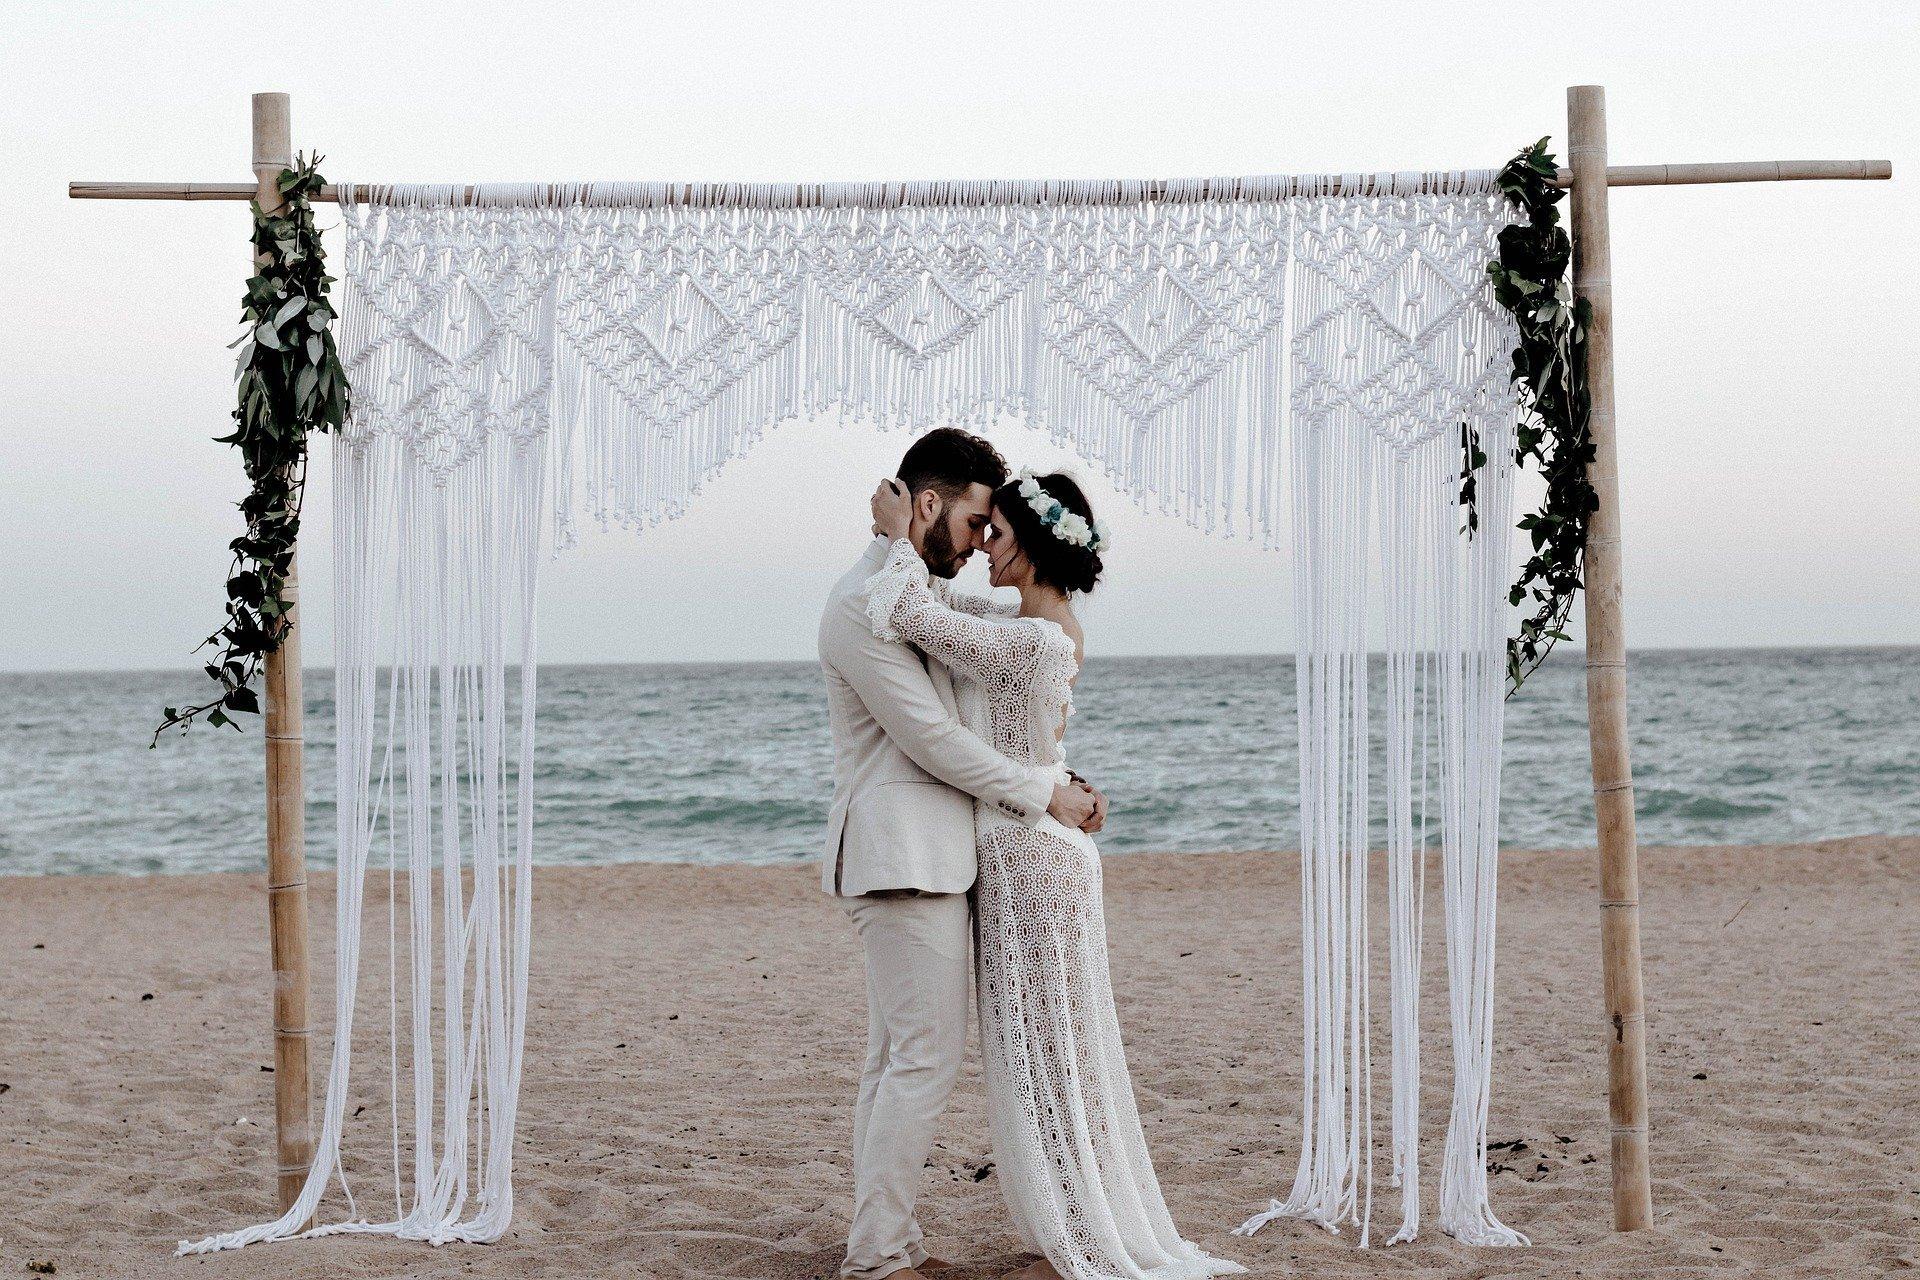 Matrimonio Tema Vino Colori : Matrimonio a tema vino idee per stupire panorama sposi